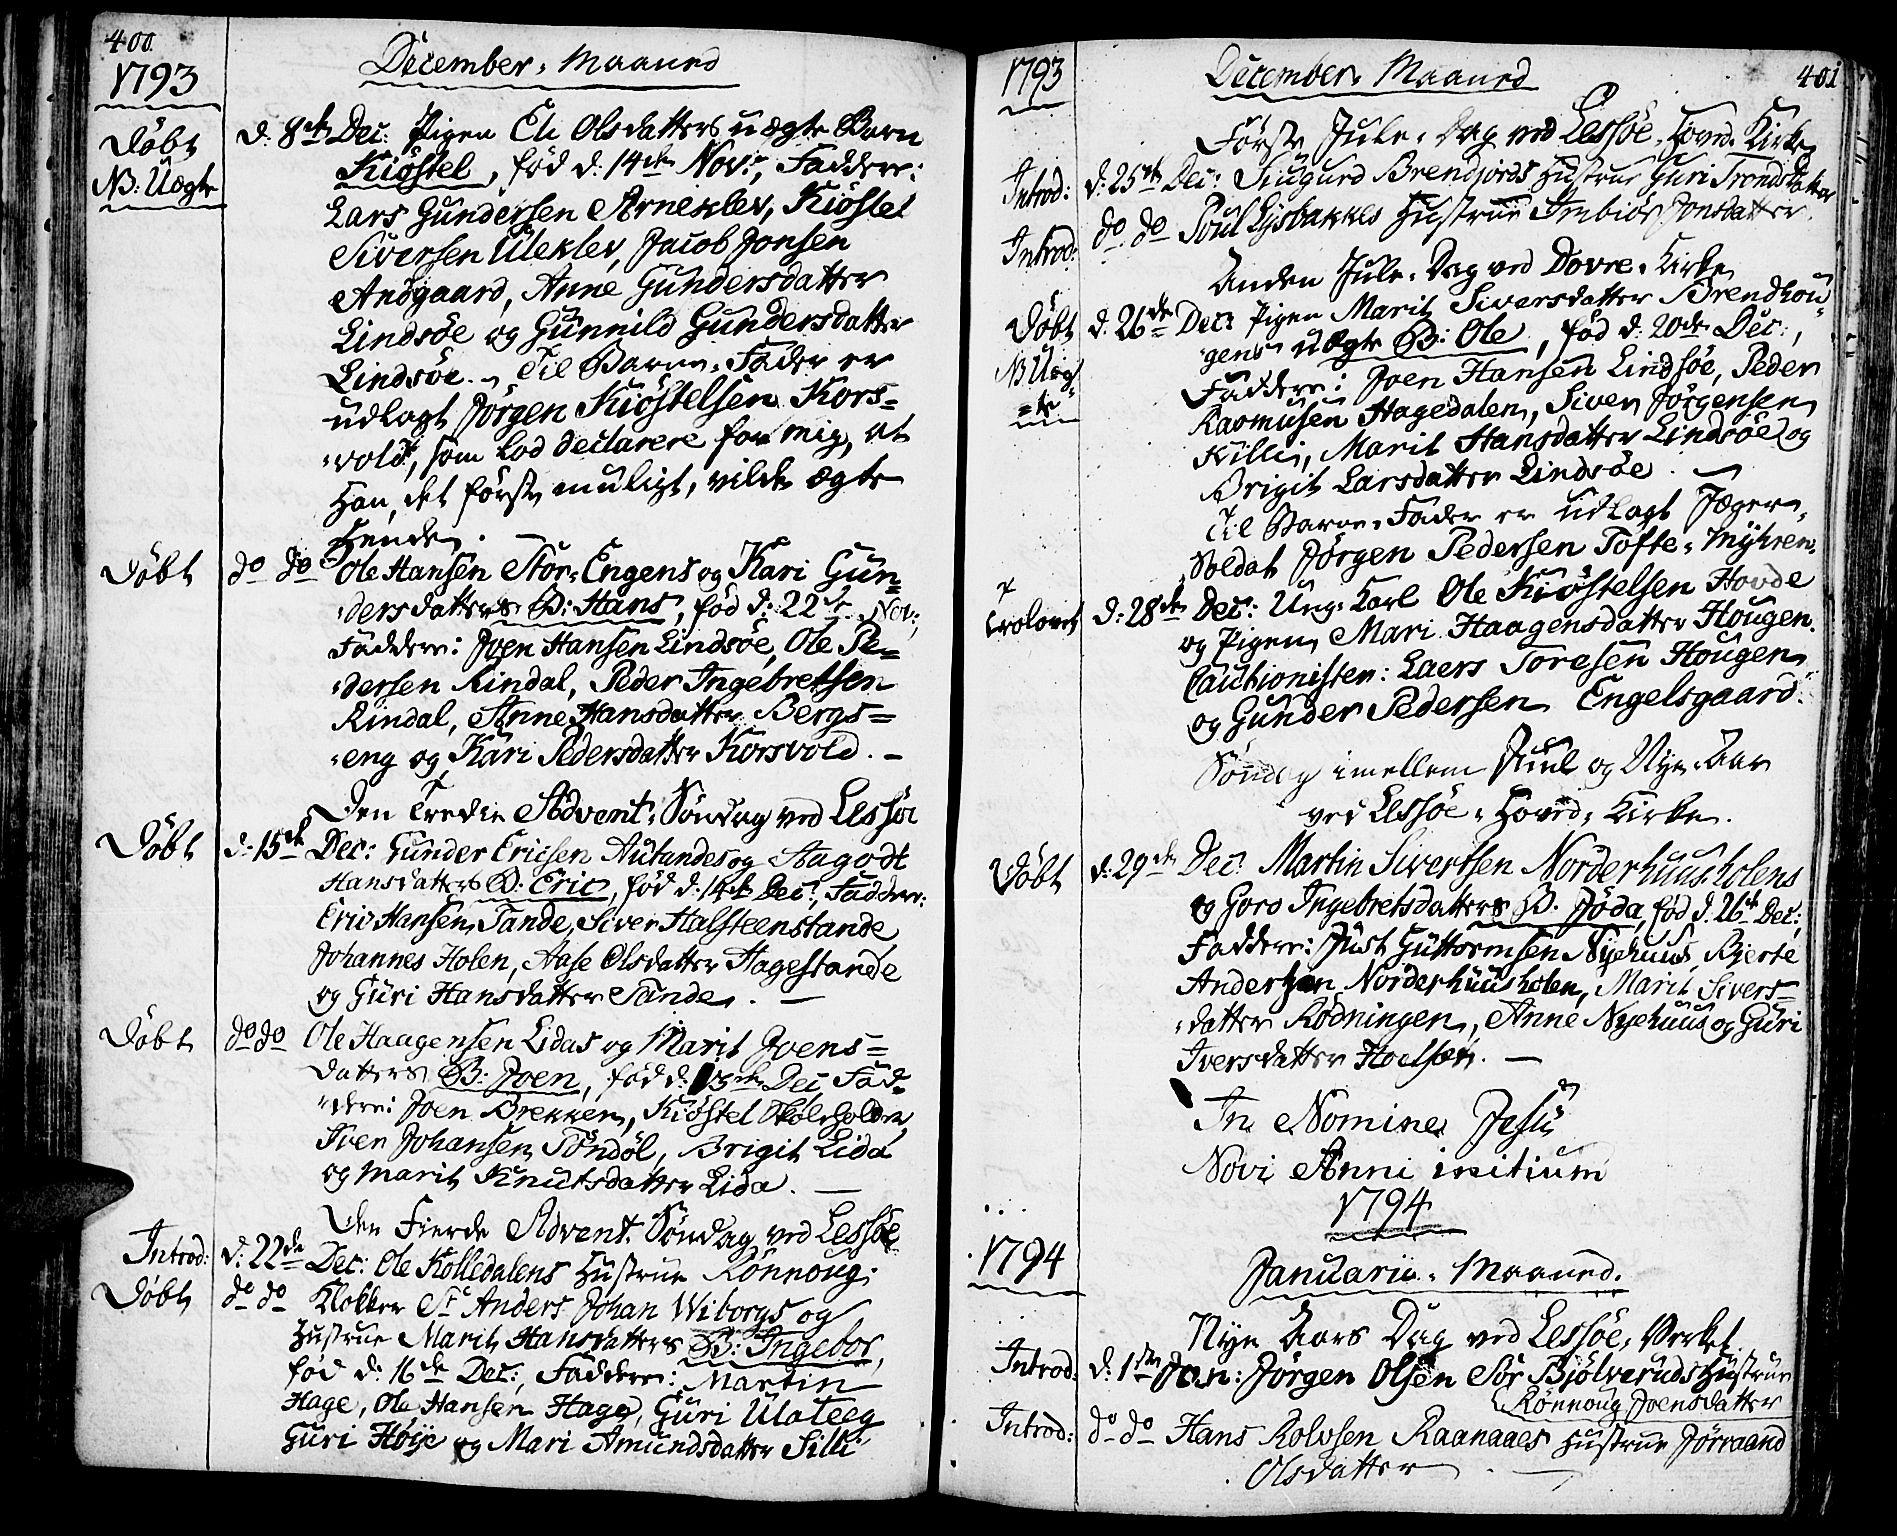 SAH, Lesja prestekontor, Ministerialbok nr. 3, 1777-1819, s. 400-401